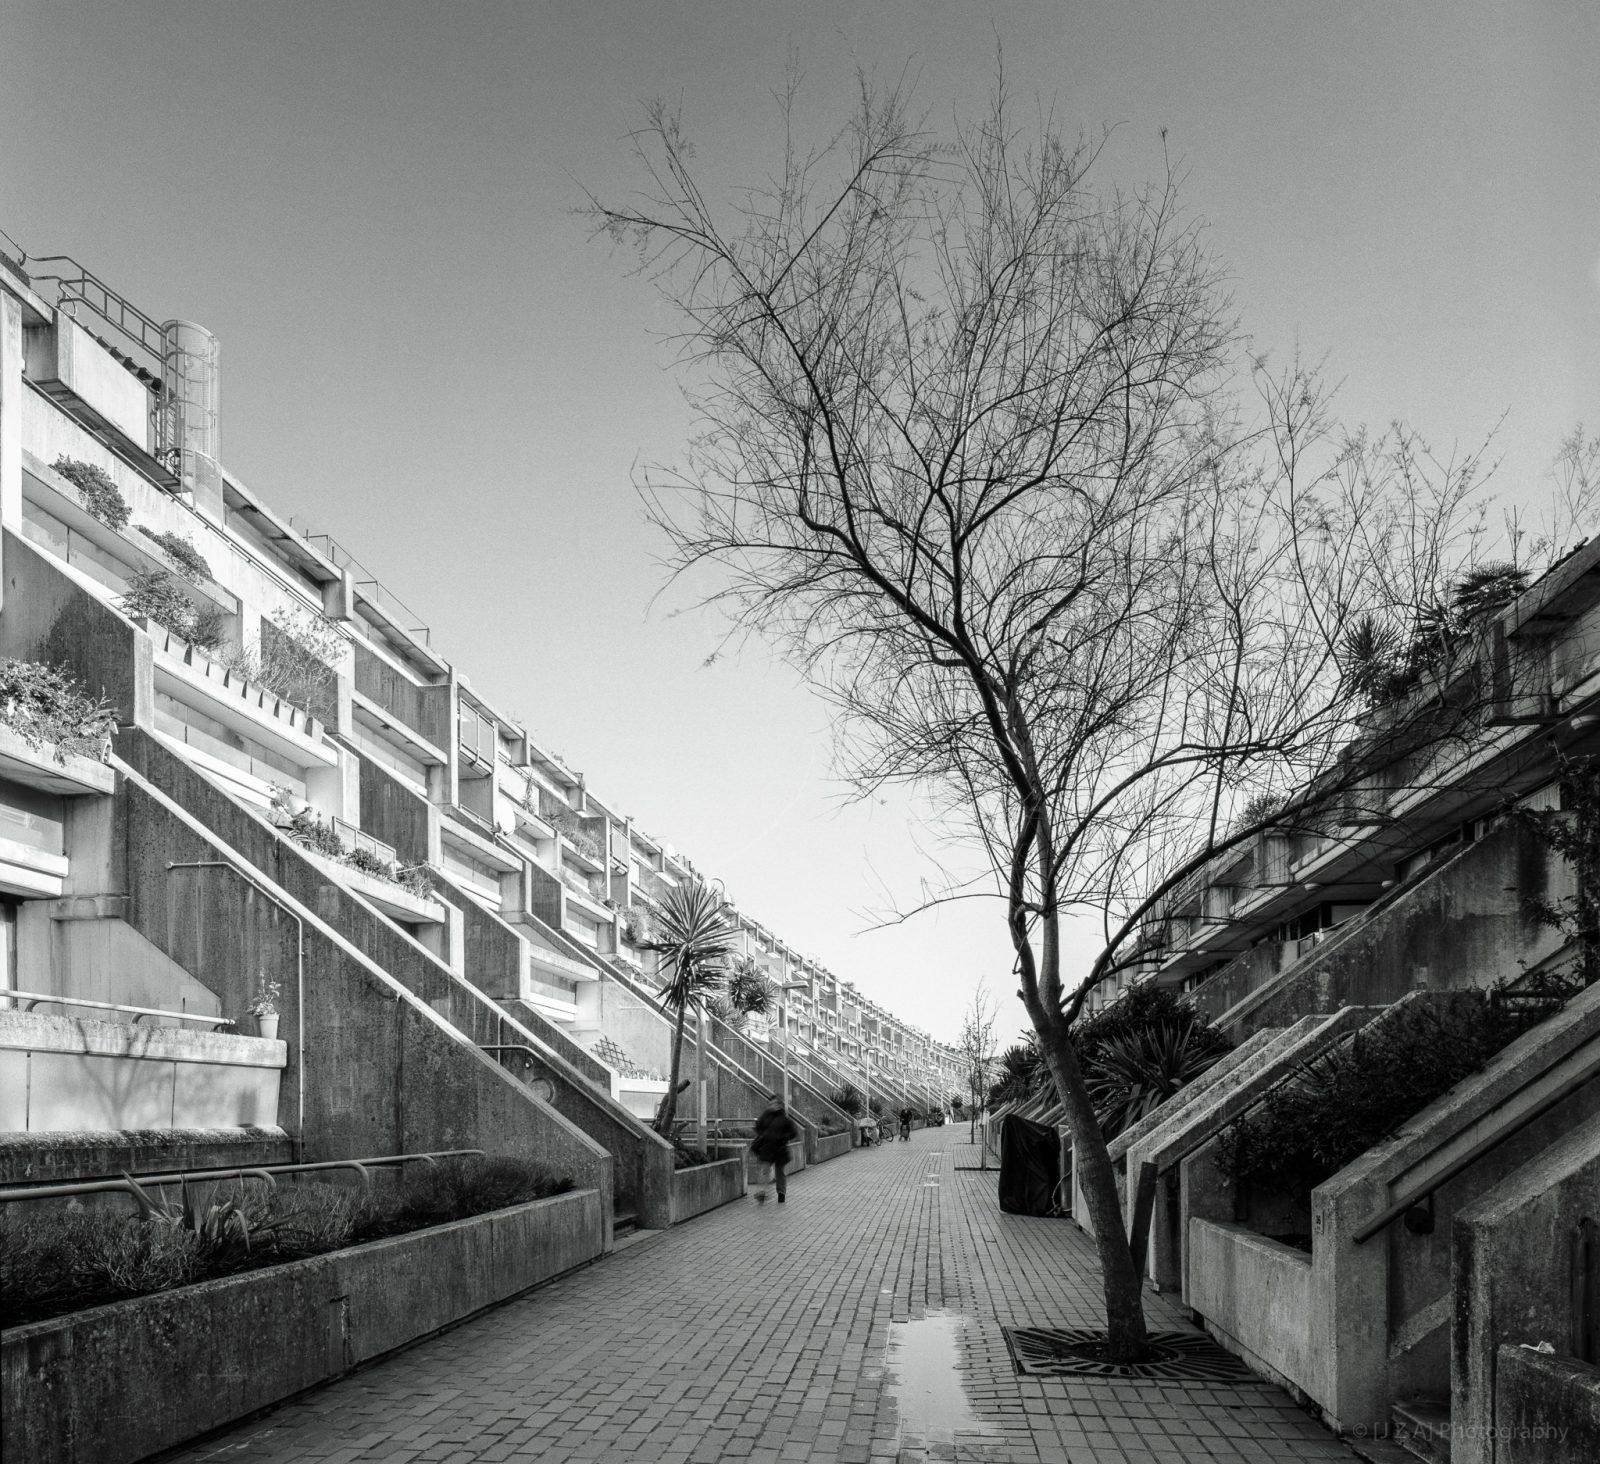 Alexandra and Ainsworth estate, aka Rowley Way